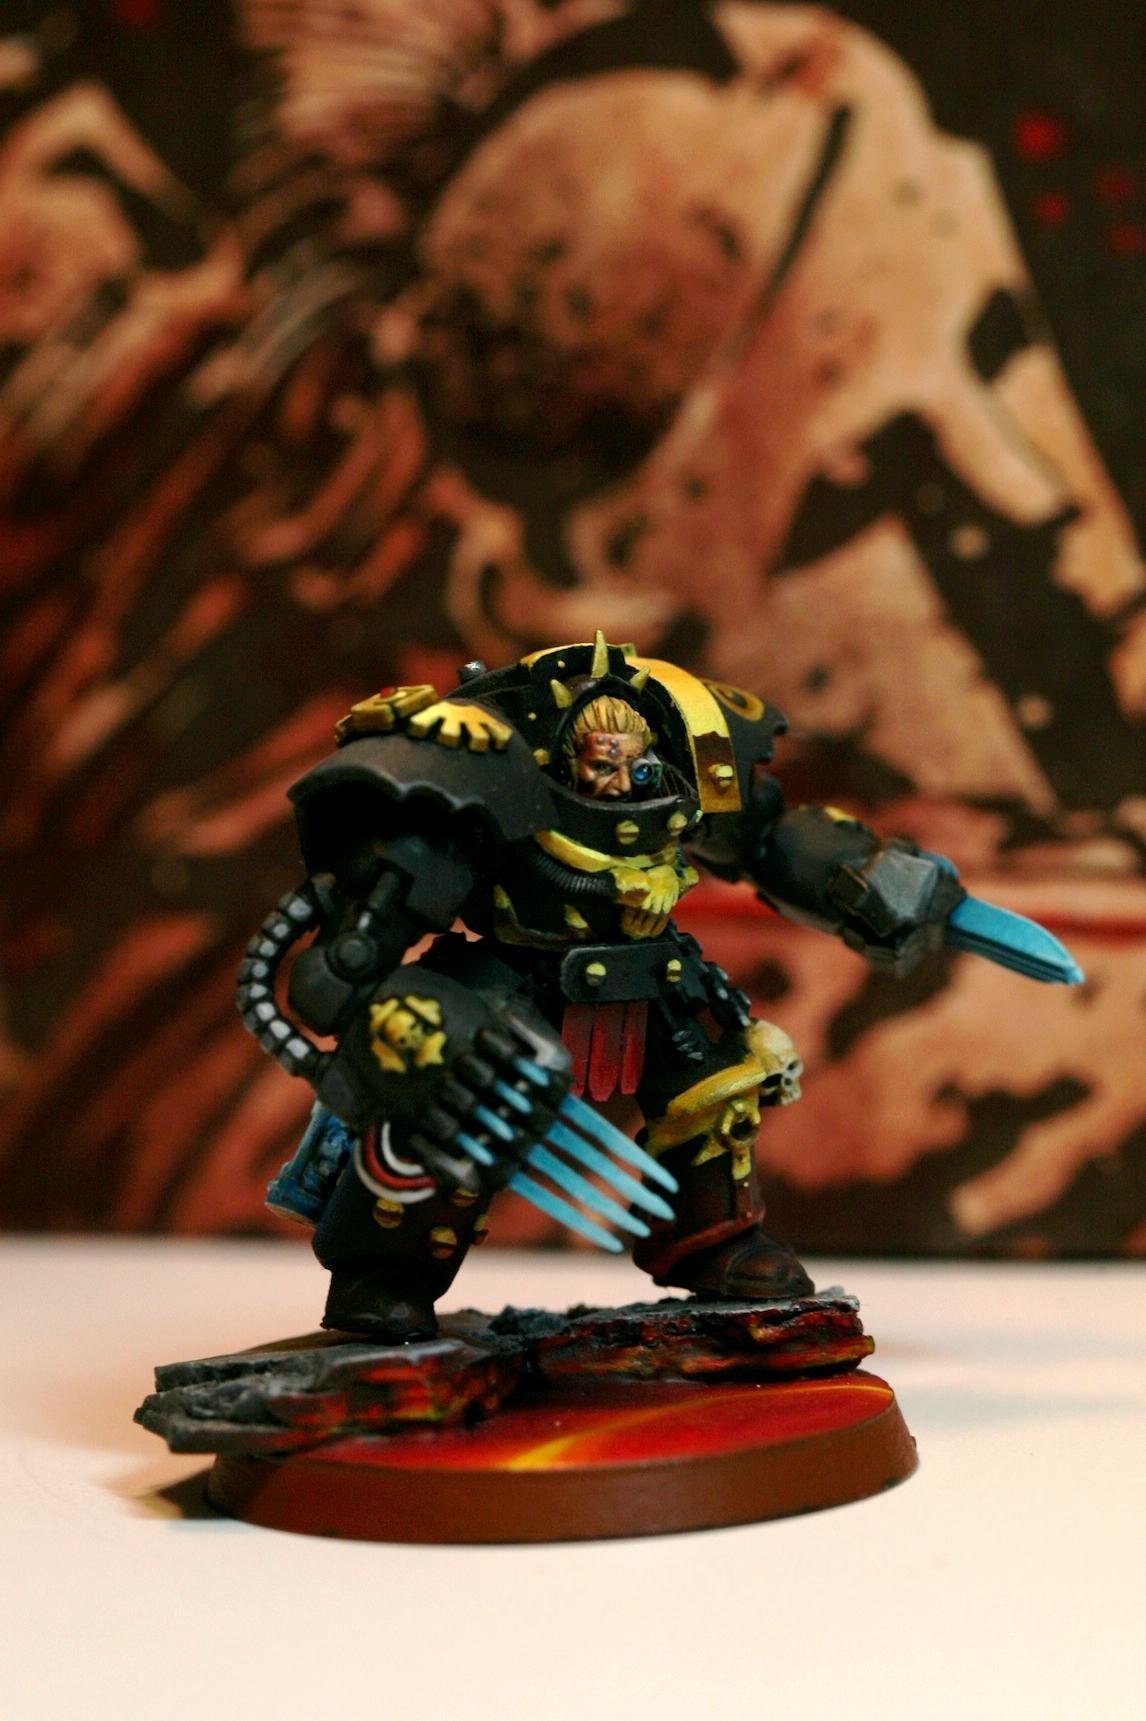 Deathwing, Horus Heresy, Lightning Claws, Preheresy, Terminator Armor